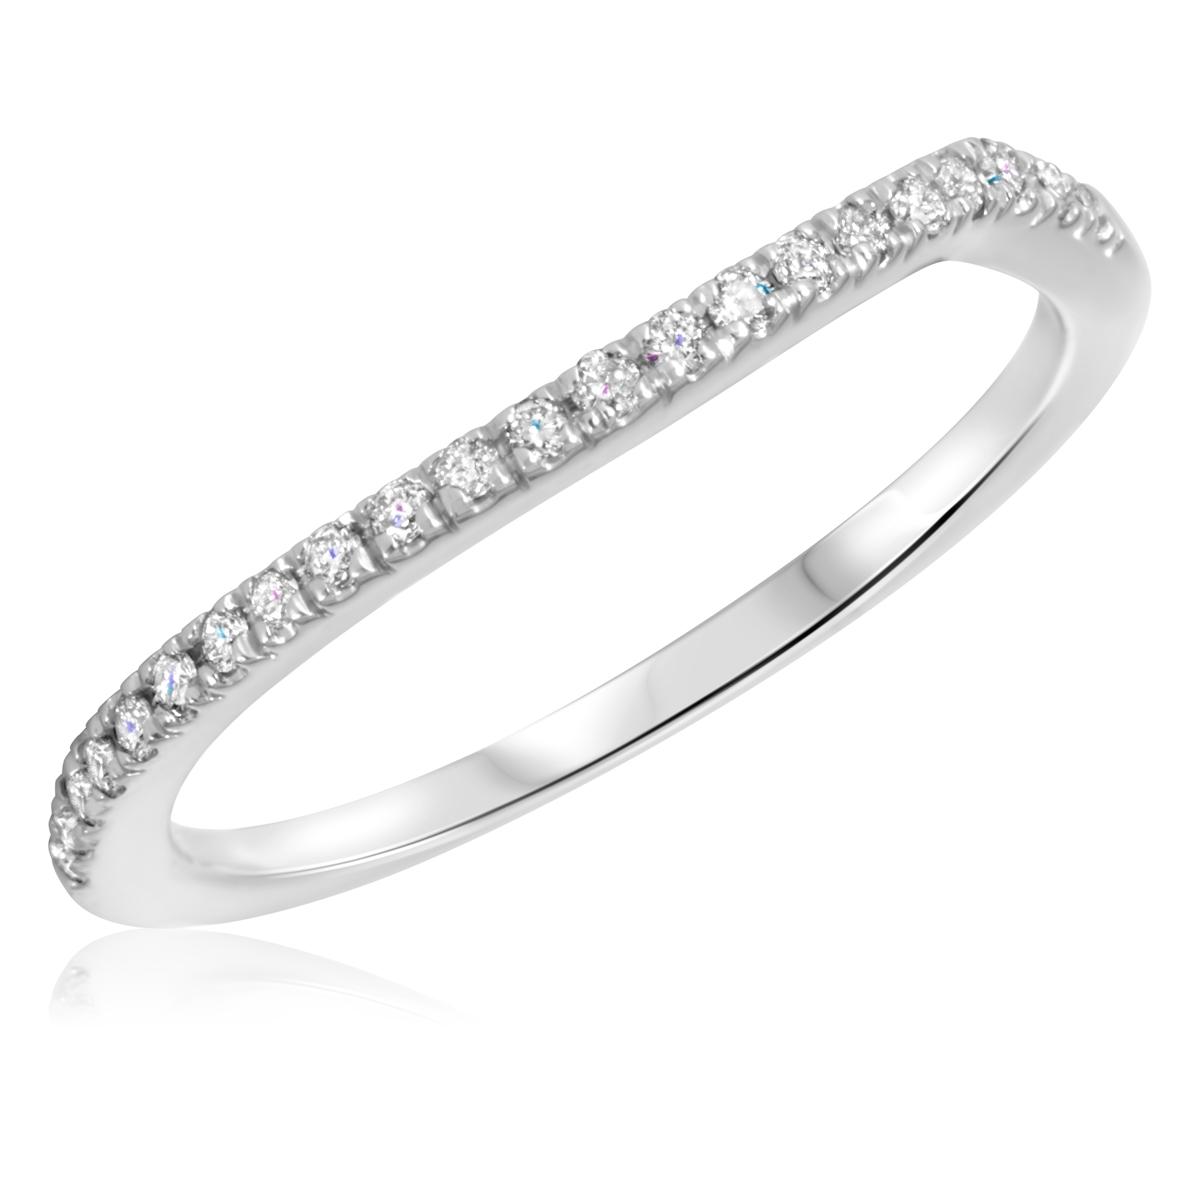 1/10 Carat T.W. Round Cut Diamond Ladies Wedding Band 10K White Gold- Size 8